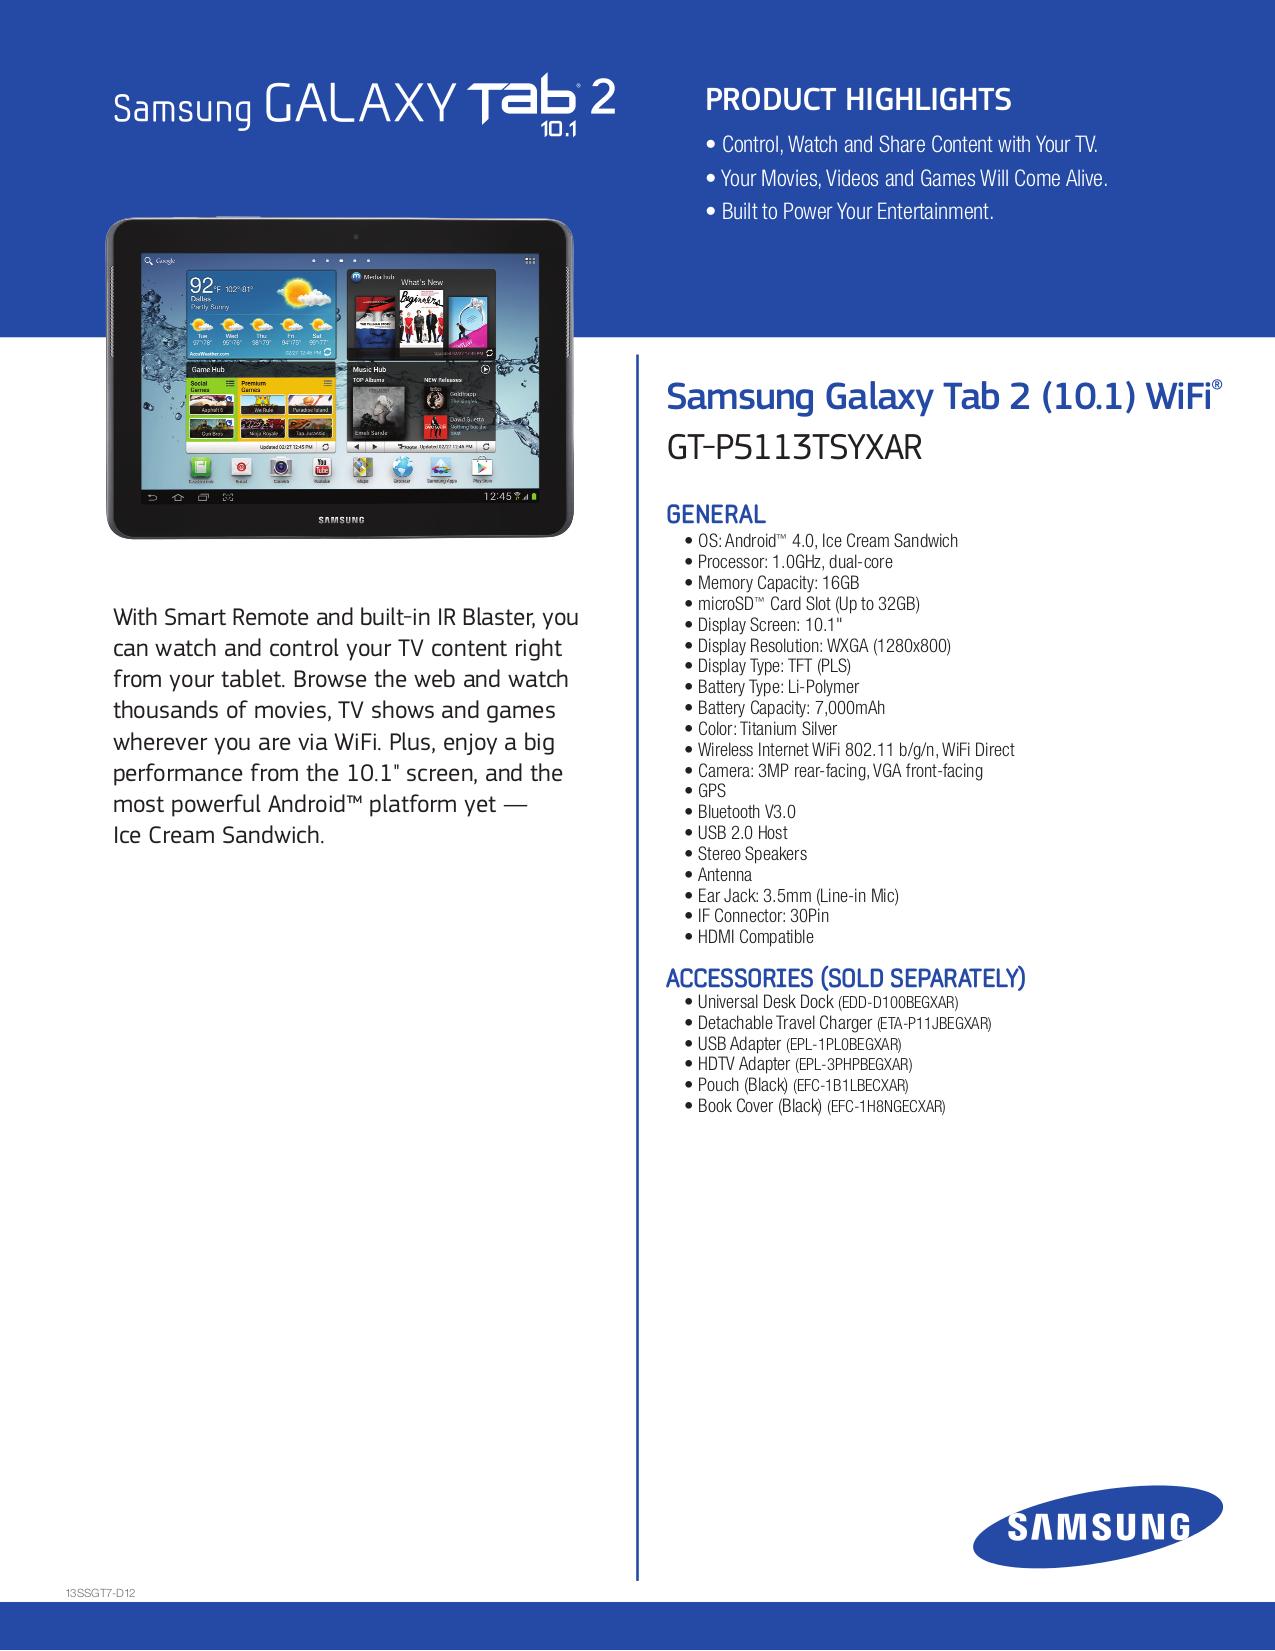 Samsung galaxy tab 4 10. 1 16gb sm-t530 tablet download instruction.